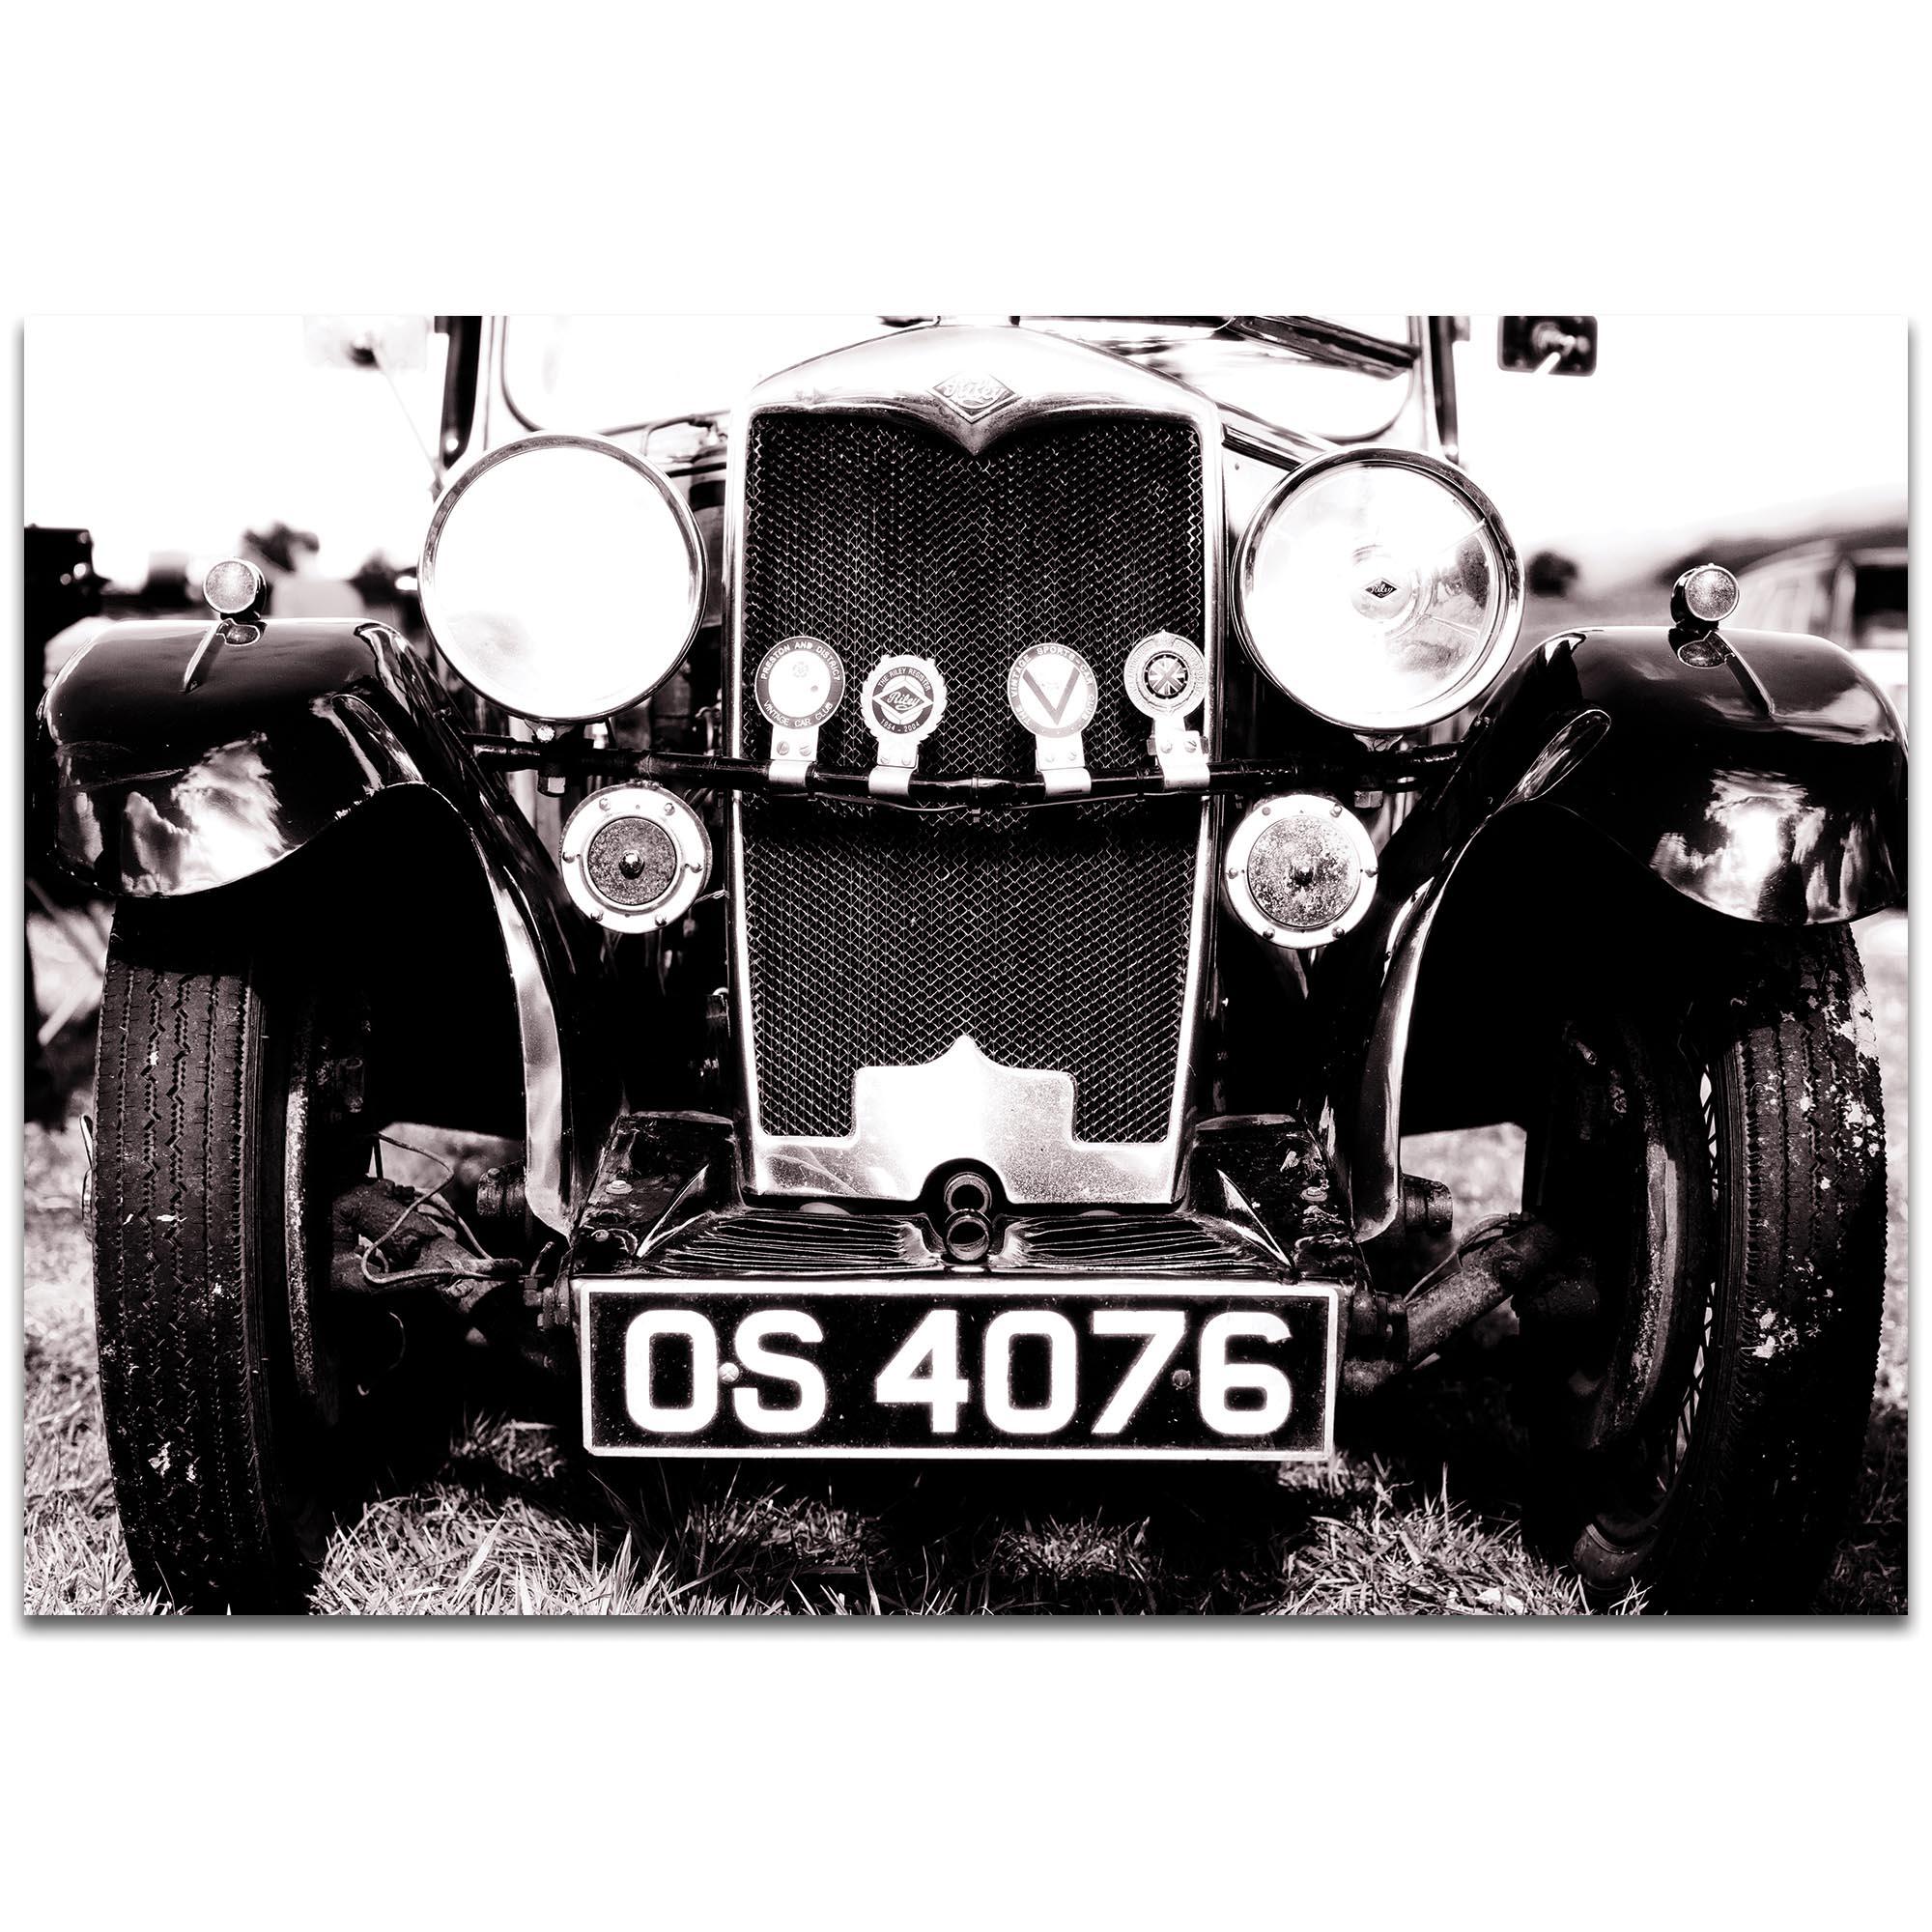 Americana Wall Art 'Vintage Grill' - Classic Cars Decor on Metal or Plexiglass